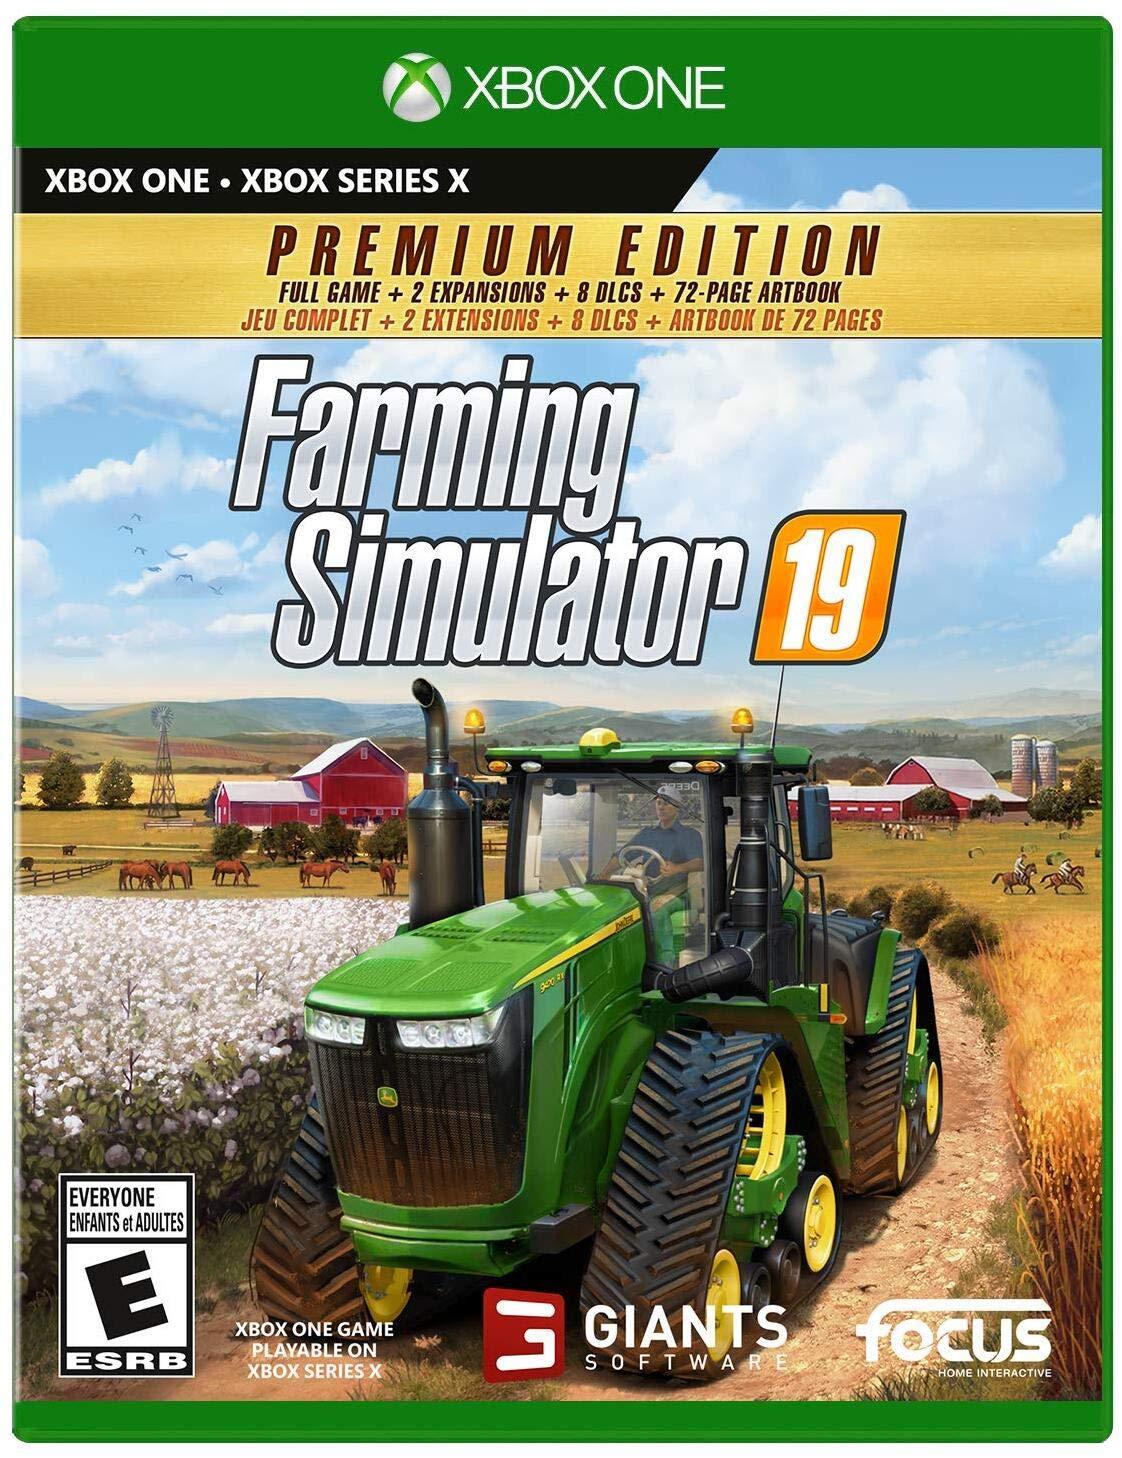 Farming Simulator 19: Premium Edition (Xb1) - Xbox One